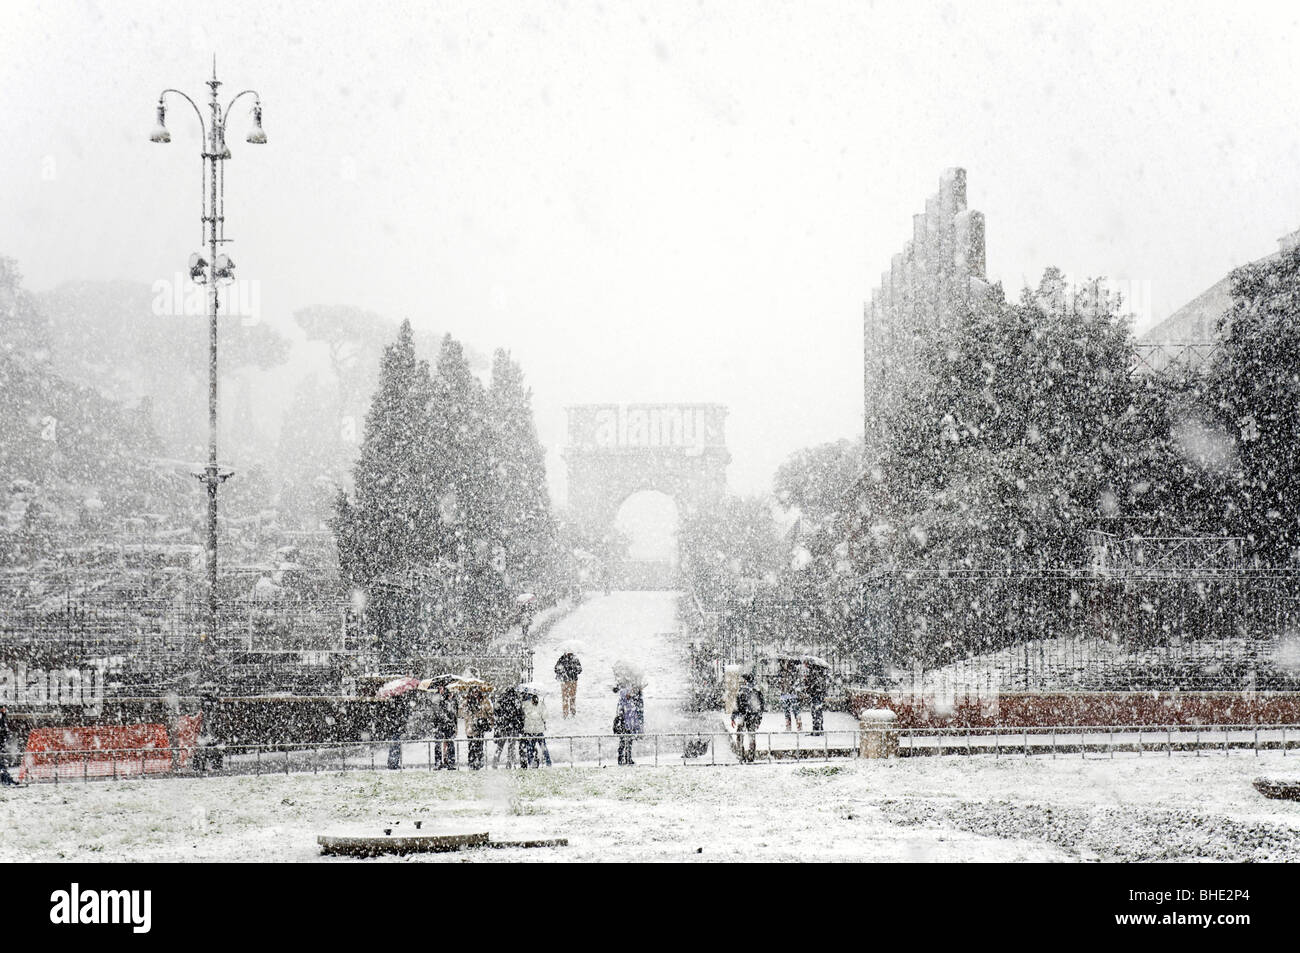 Titus Arch and Via Sacra under heavy snow, Rome Italy - Stock Image